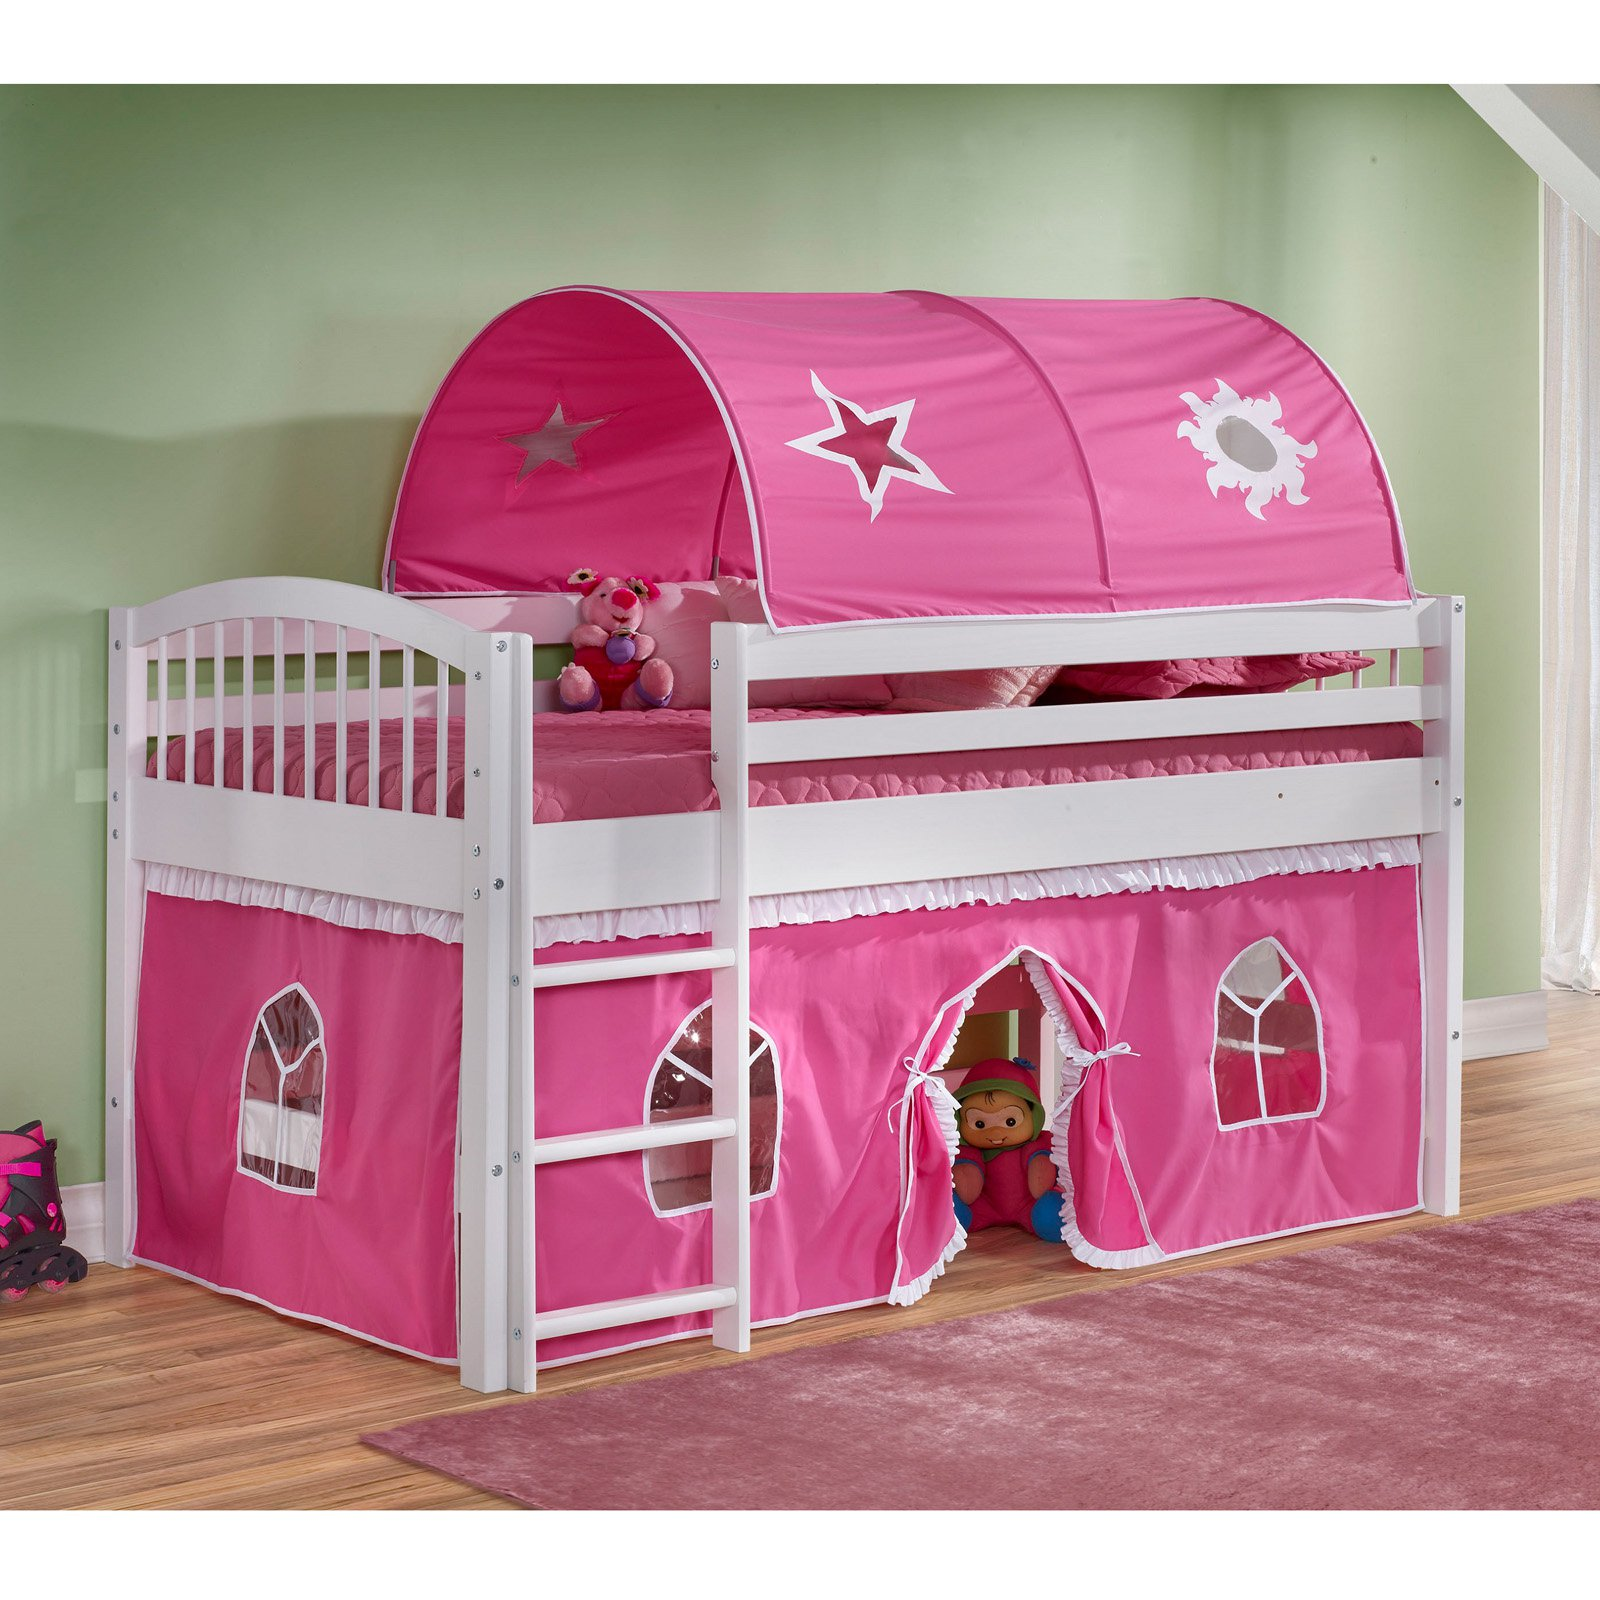 Addison Cinnamon Finish Junior Loft Bed, Blue Tent and Playhouse